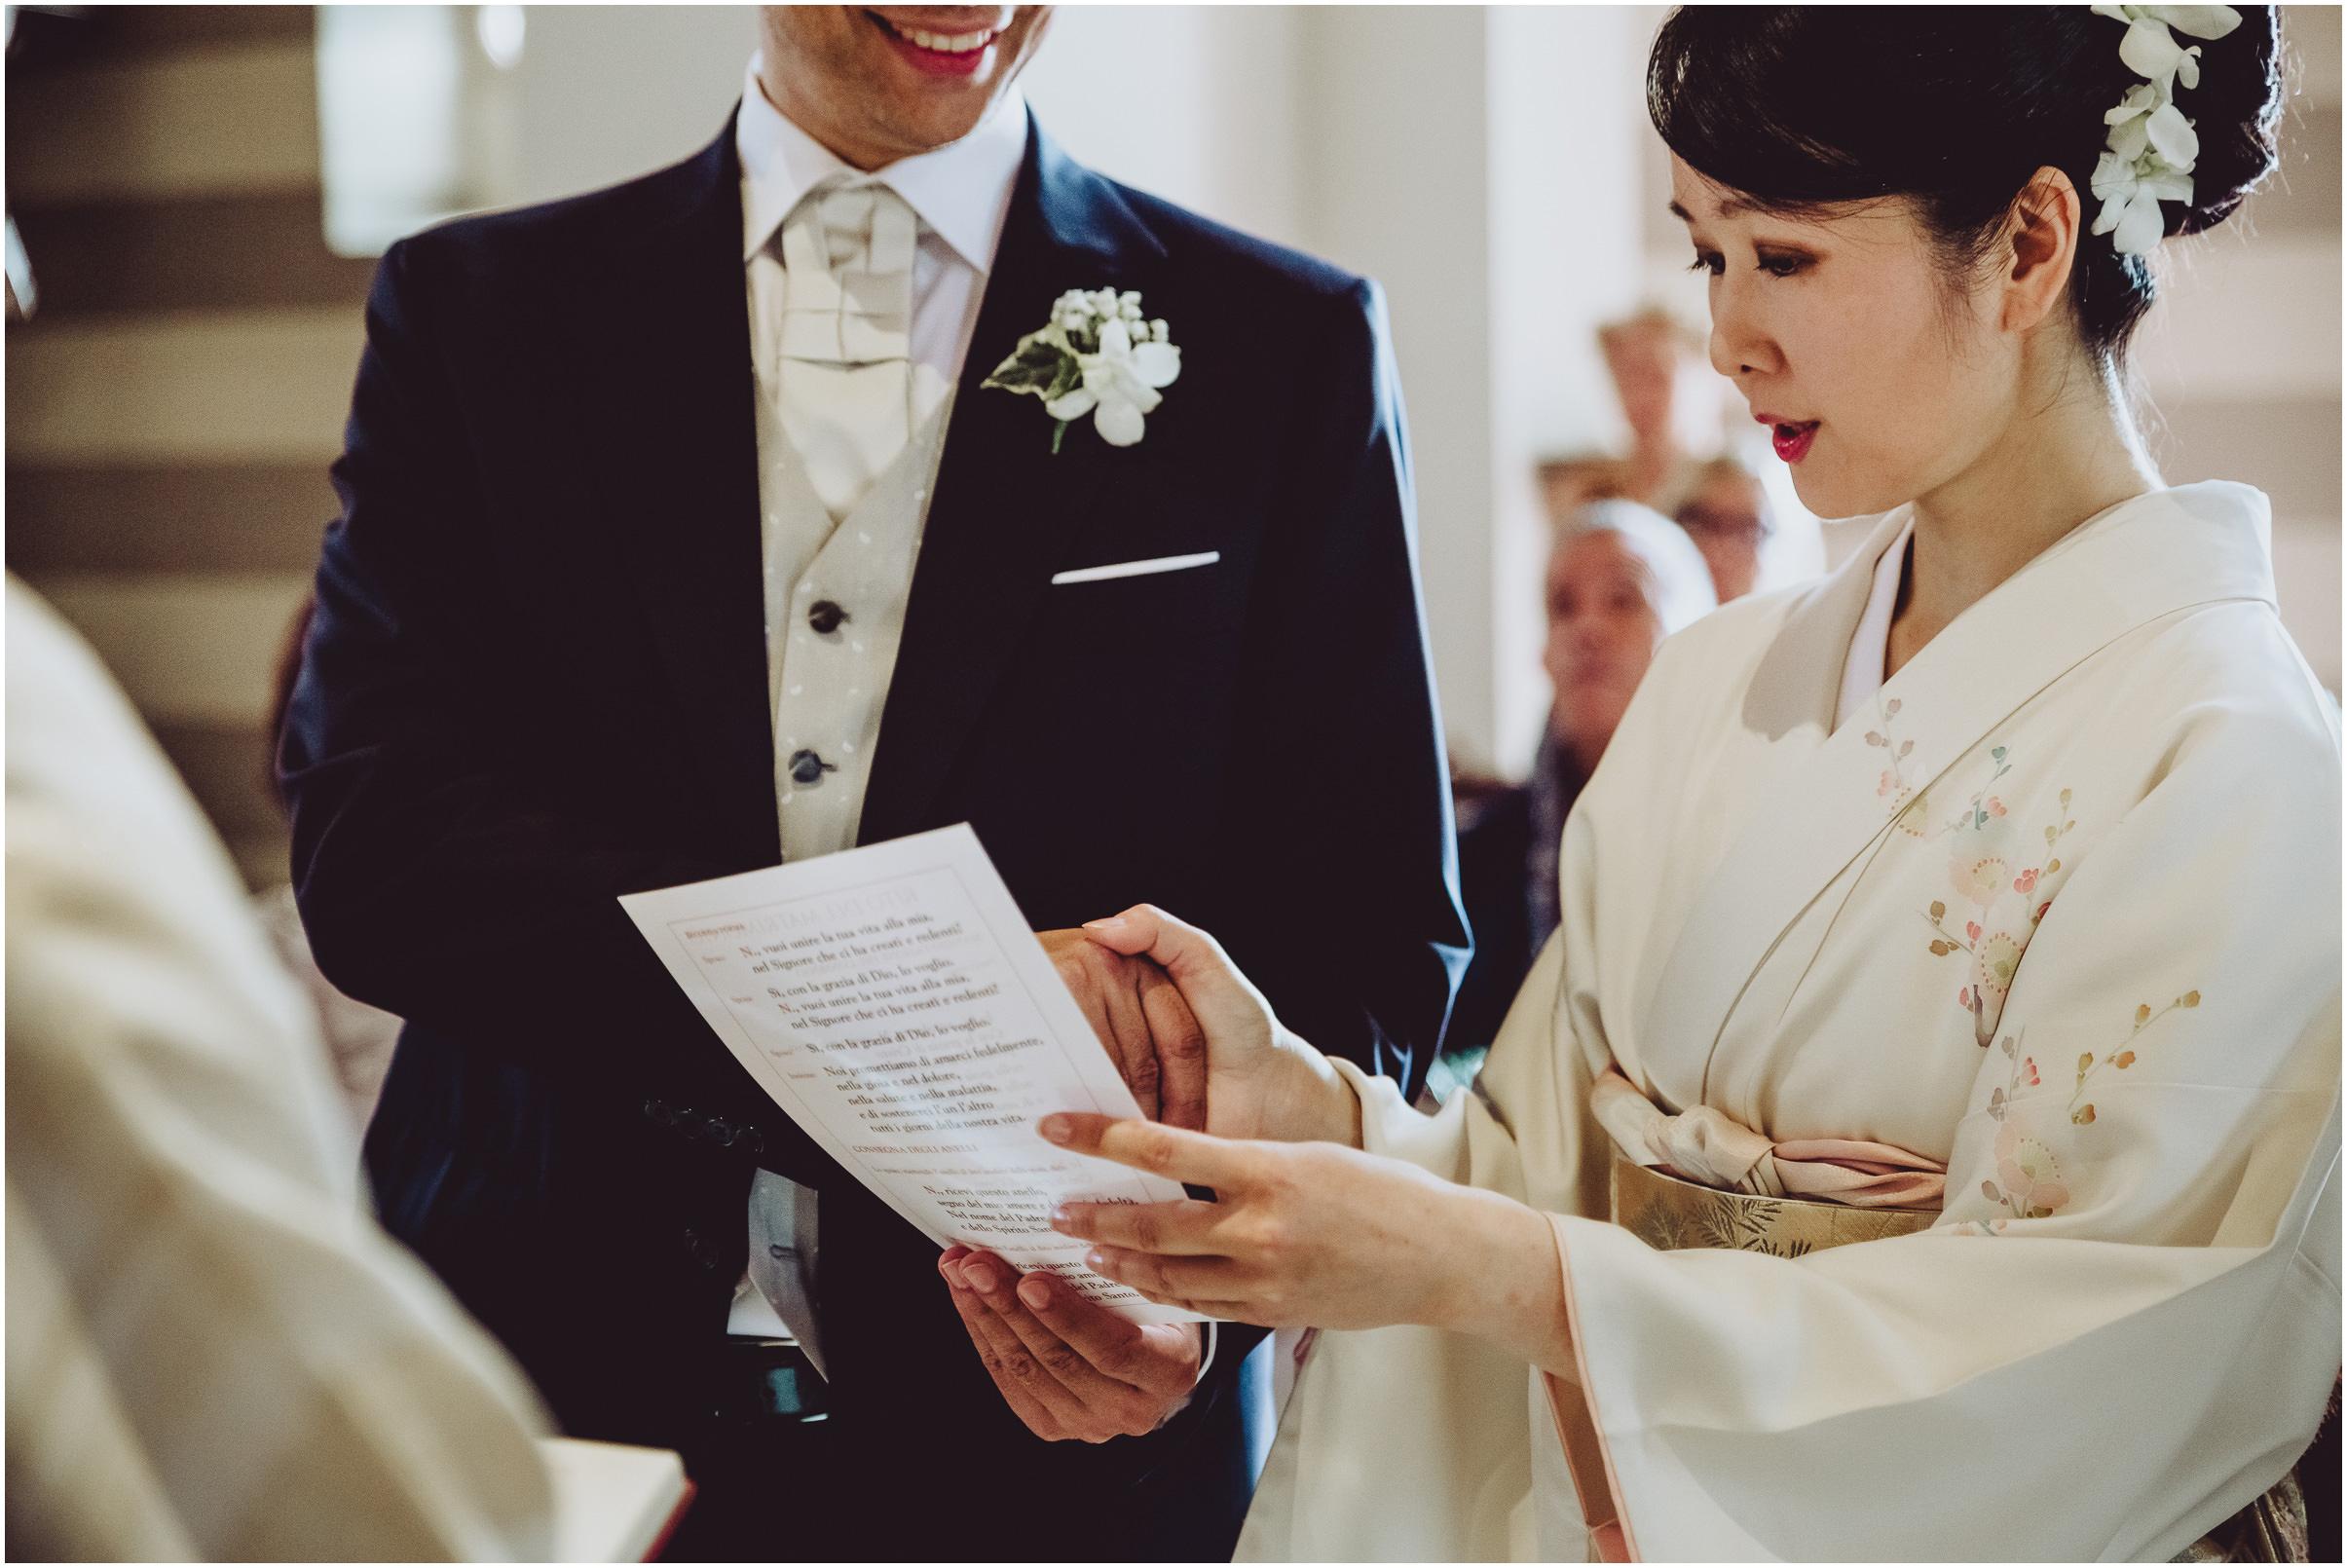 WEDDING-PHOTOGRAPHY-SARA-LORENZONI-FOTOGRAFIA-MATRIMONIO-ORVIETO-JUKA-ANTONELLO14